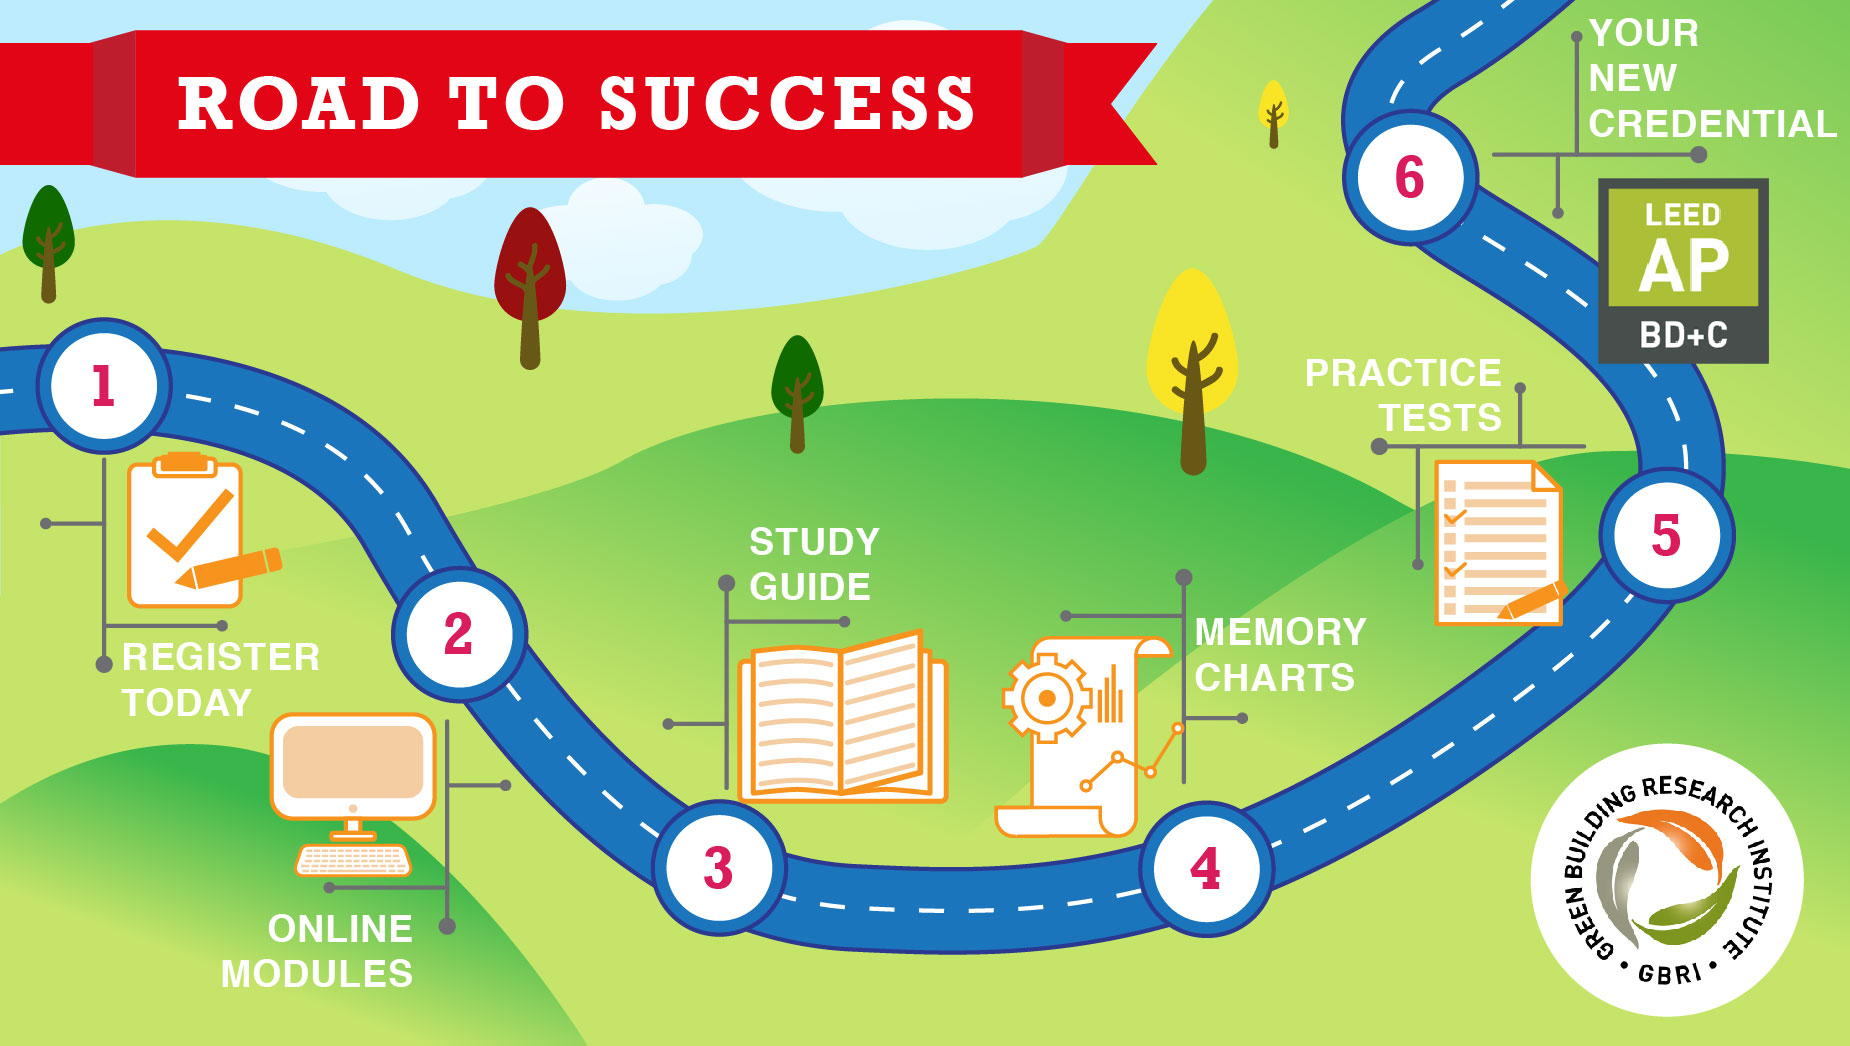 All-Inclusive LEED v4 BD+C Exam Preparation